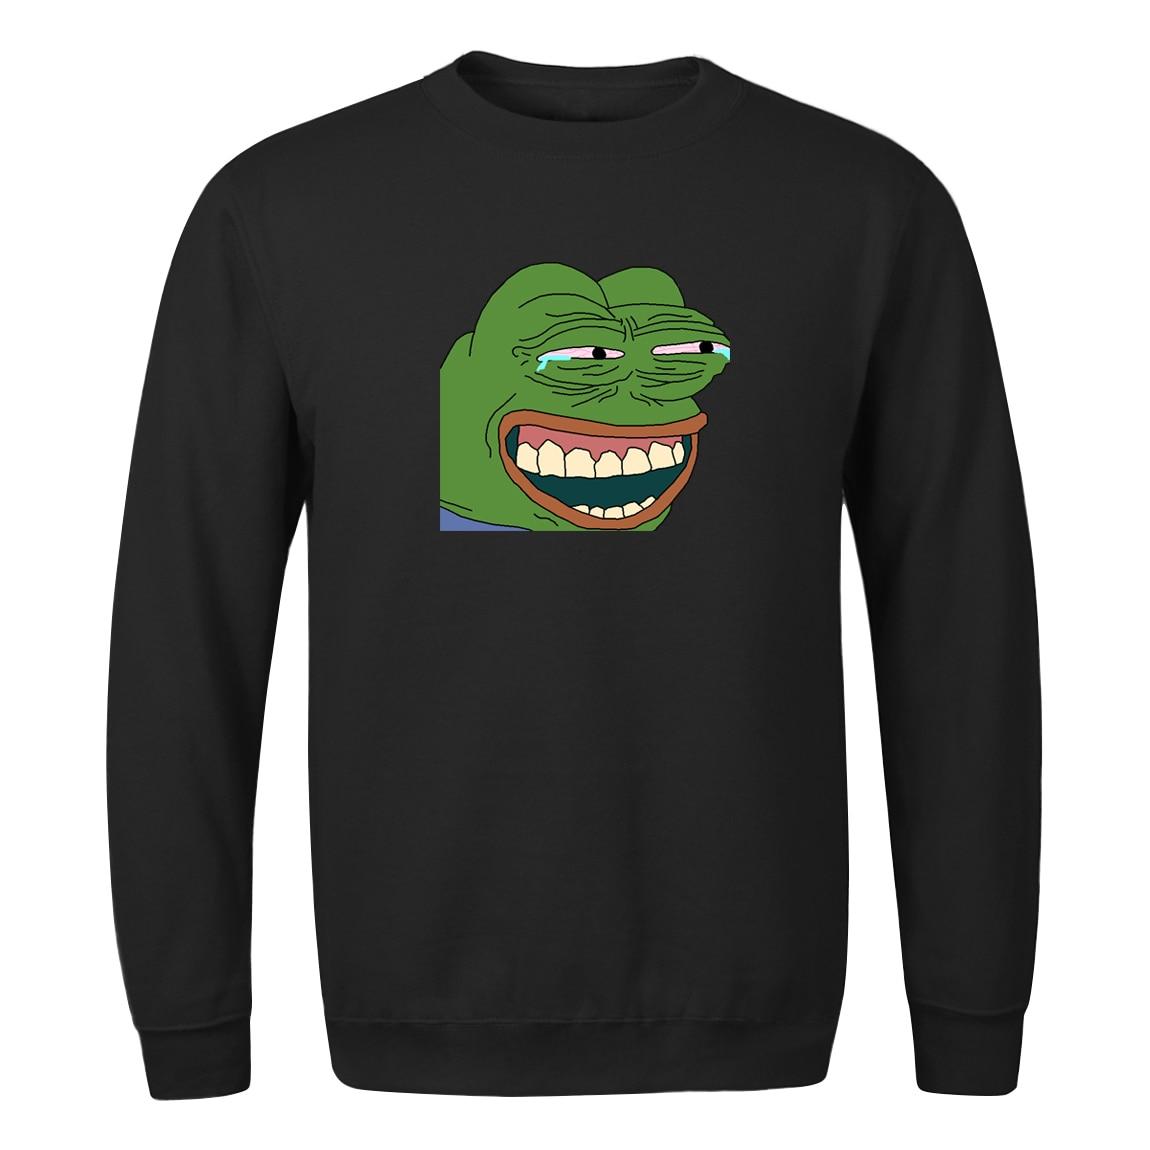 2020 Frog Print Sweatshirts Streetwear Funny Star Wars Male Pullovers Men Women Casual High Quality Hoodies Master Yoda Top